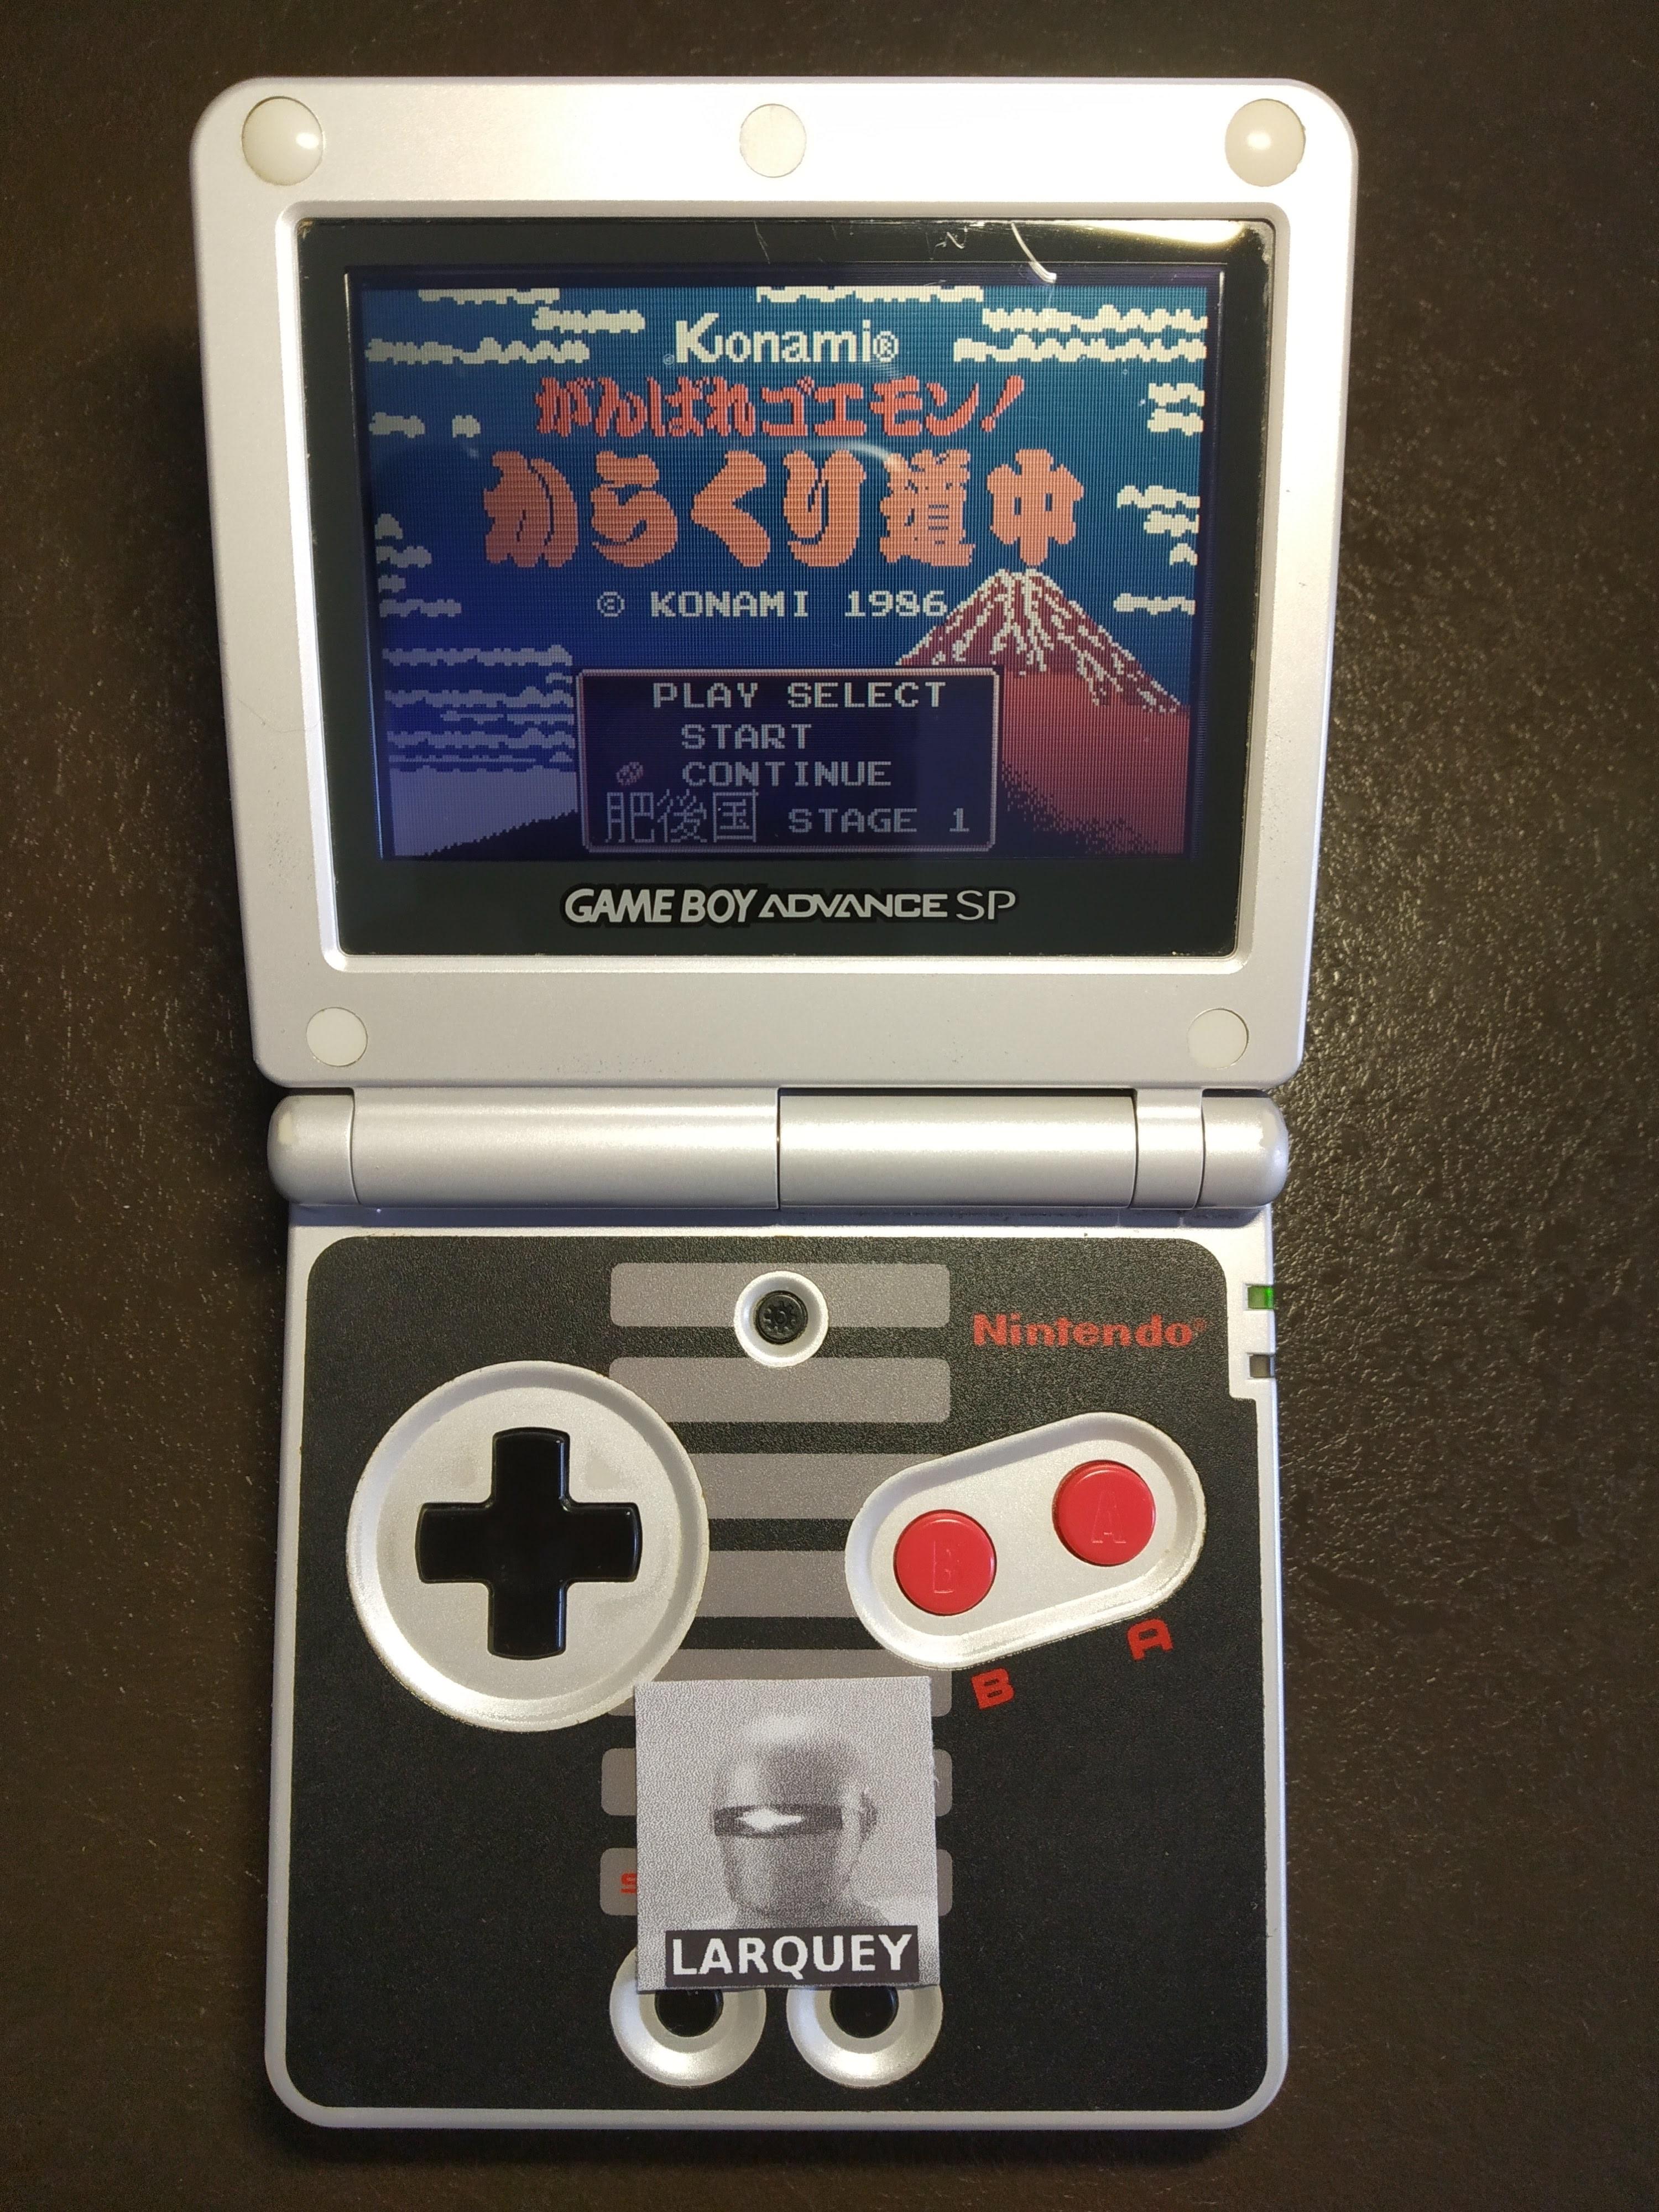 Larquey: Famicom Mini Vol. 20: Ganbare Goemon! Karakuri Douchuu (GBA) 16,400 points on 2019-12-27 08:49:41